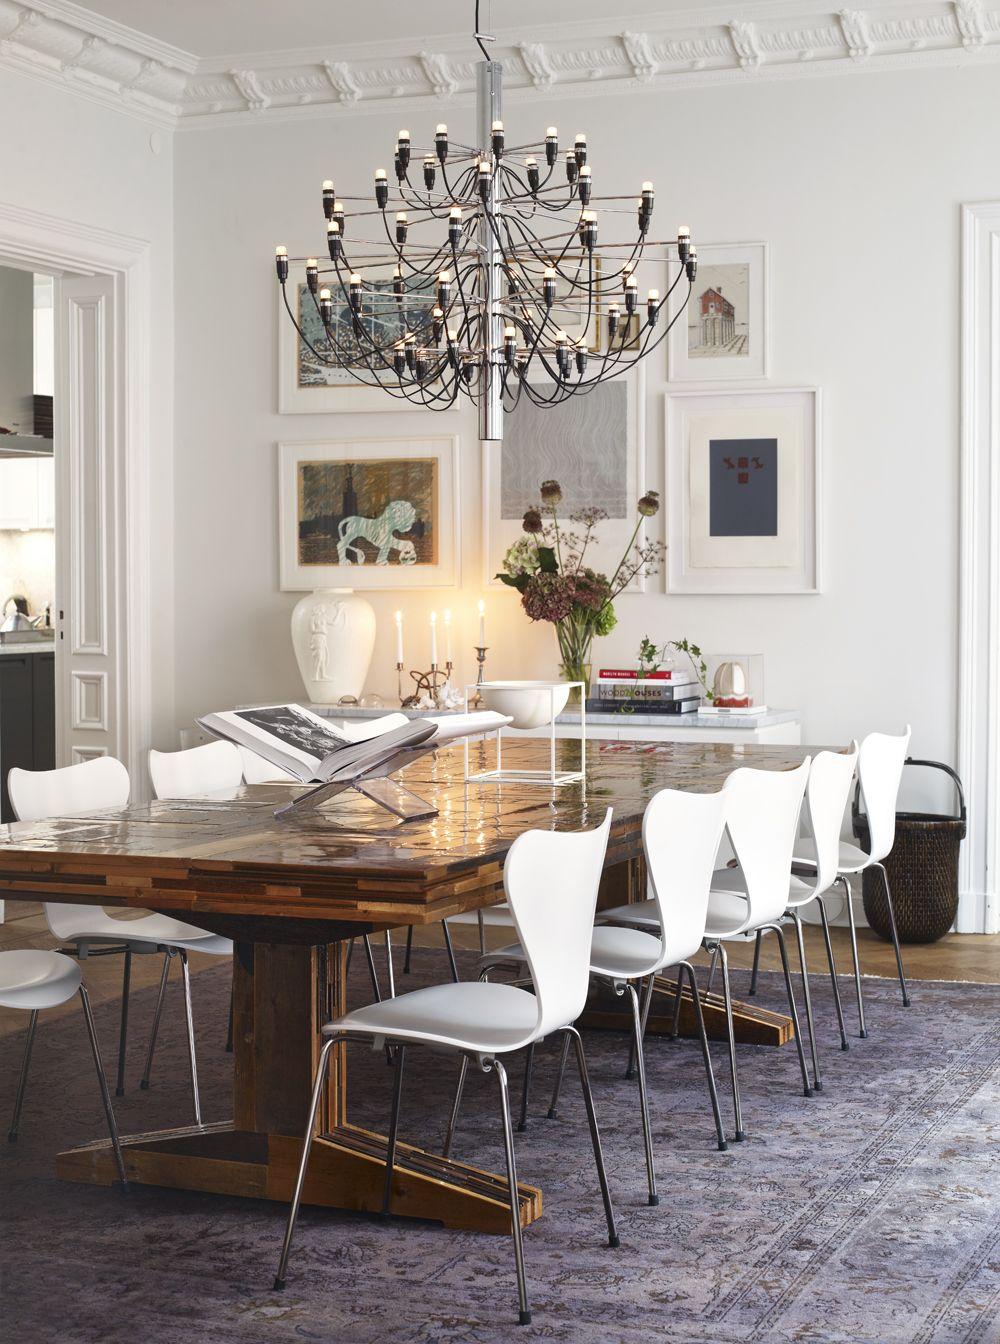 Esszimmer leuchtet zeitgenössisch elegant mix i talsvåningen  i need a new table  pinterest